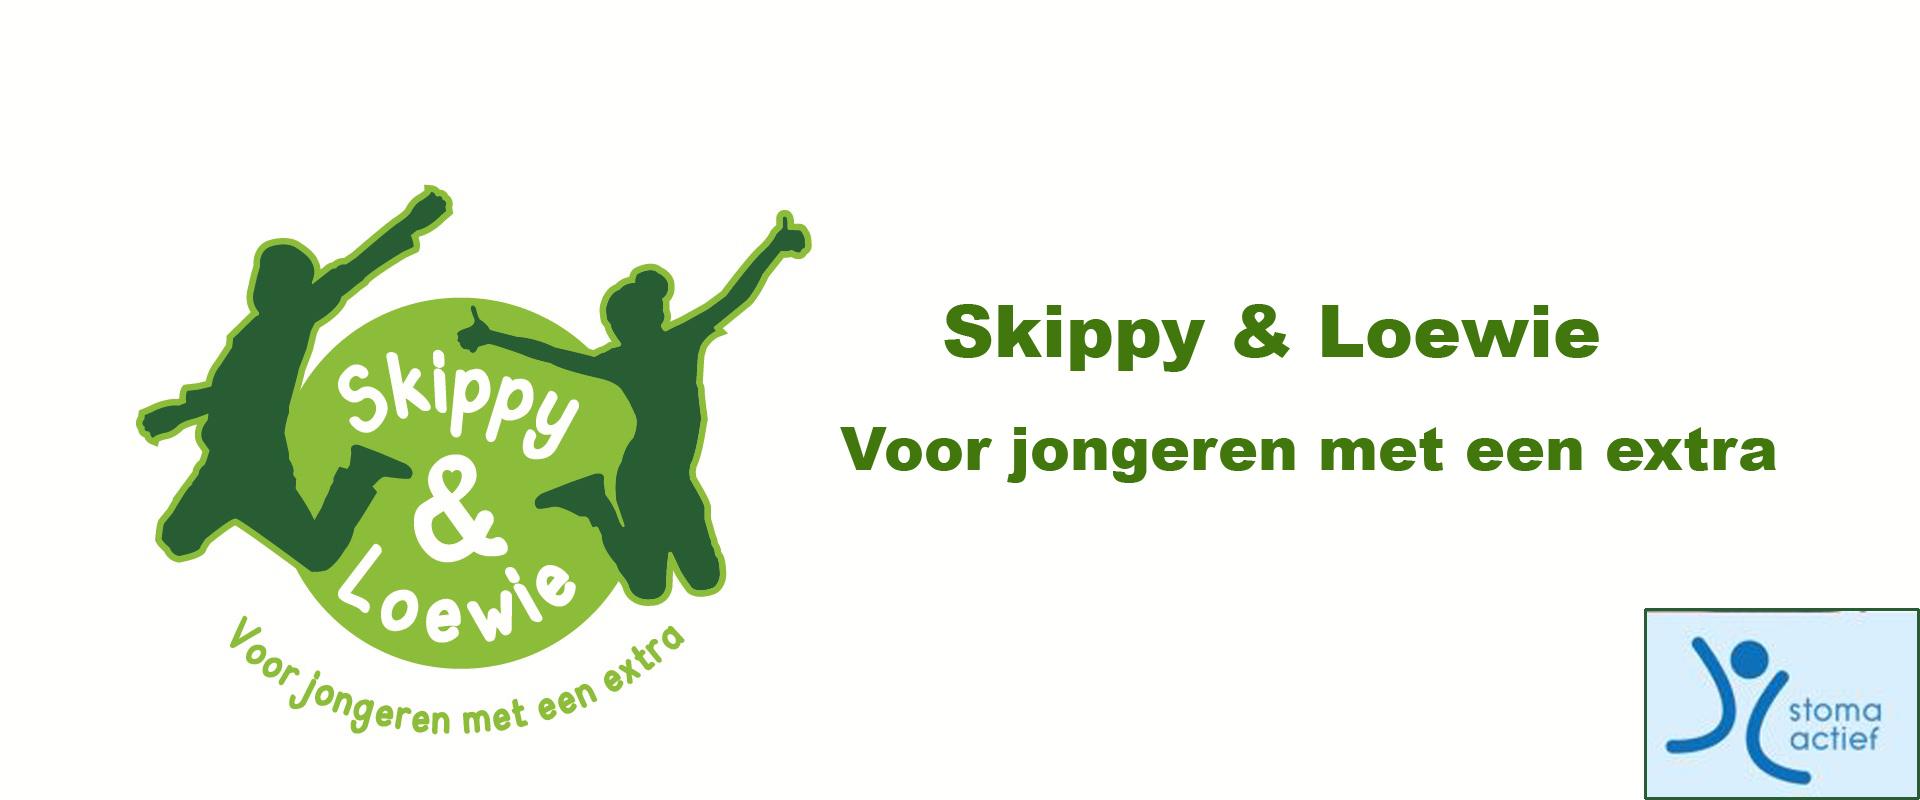 Skippy&Loewie, jongeren , stoma